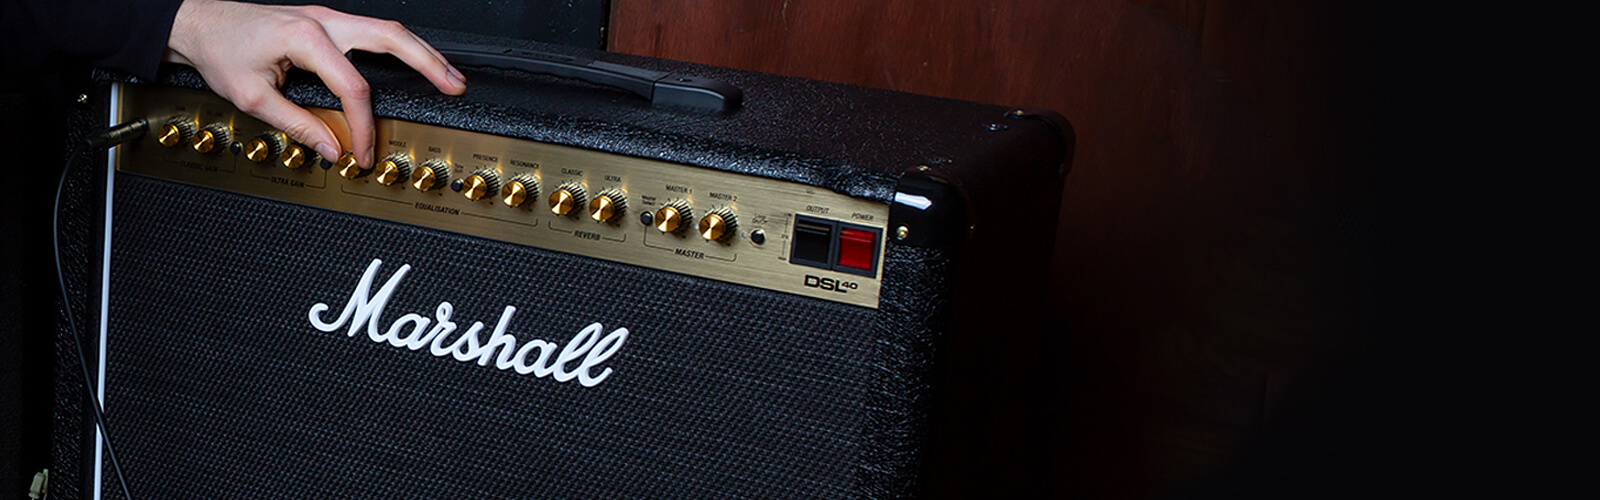 Marshall guitar amp being adjusted